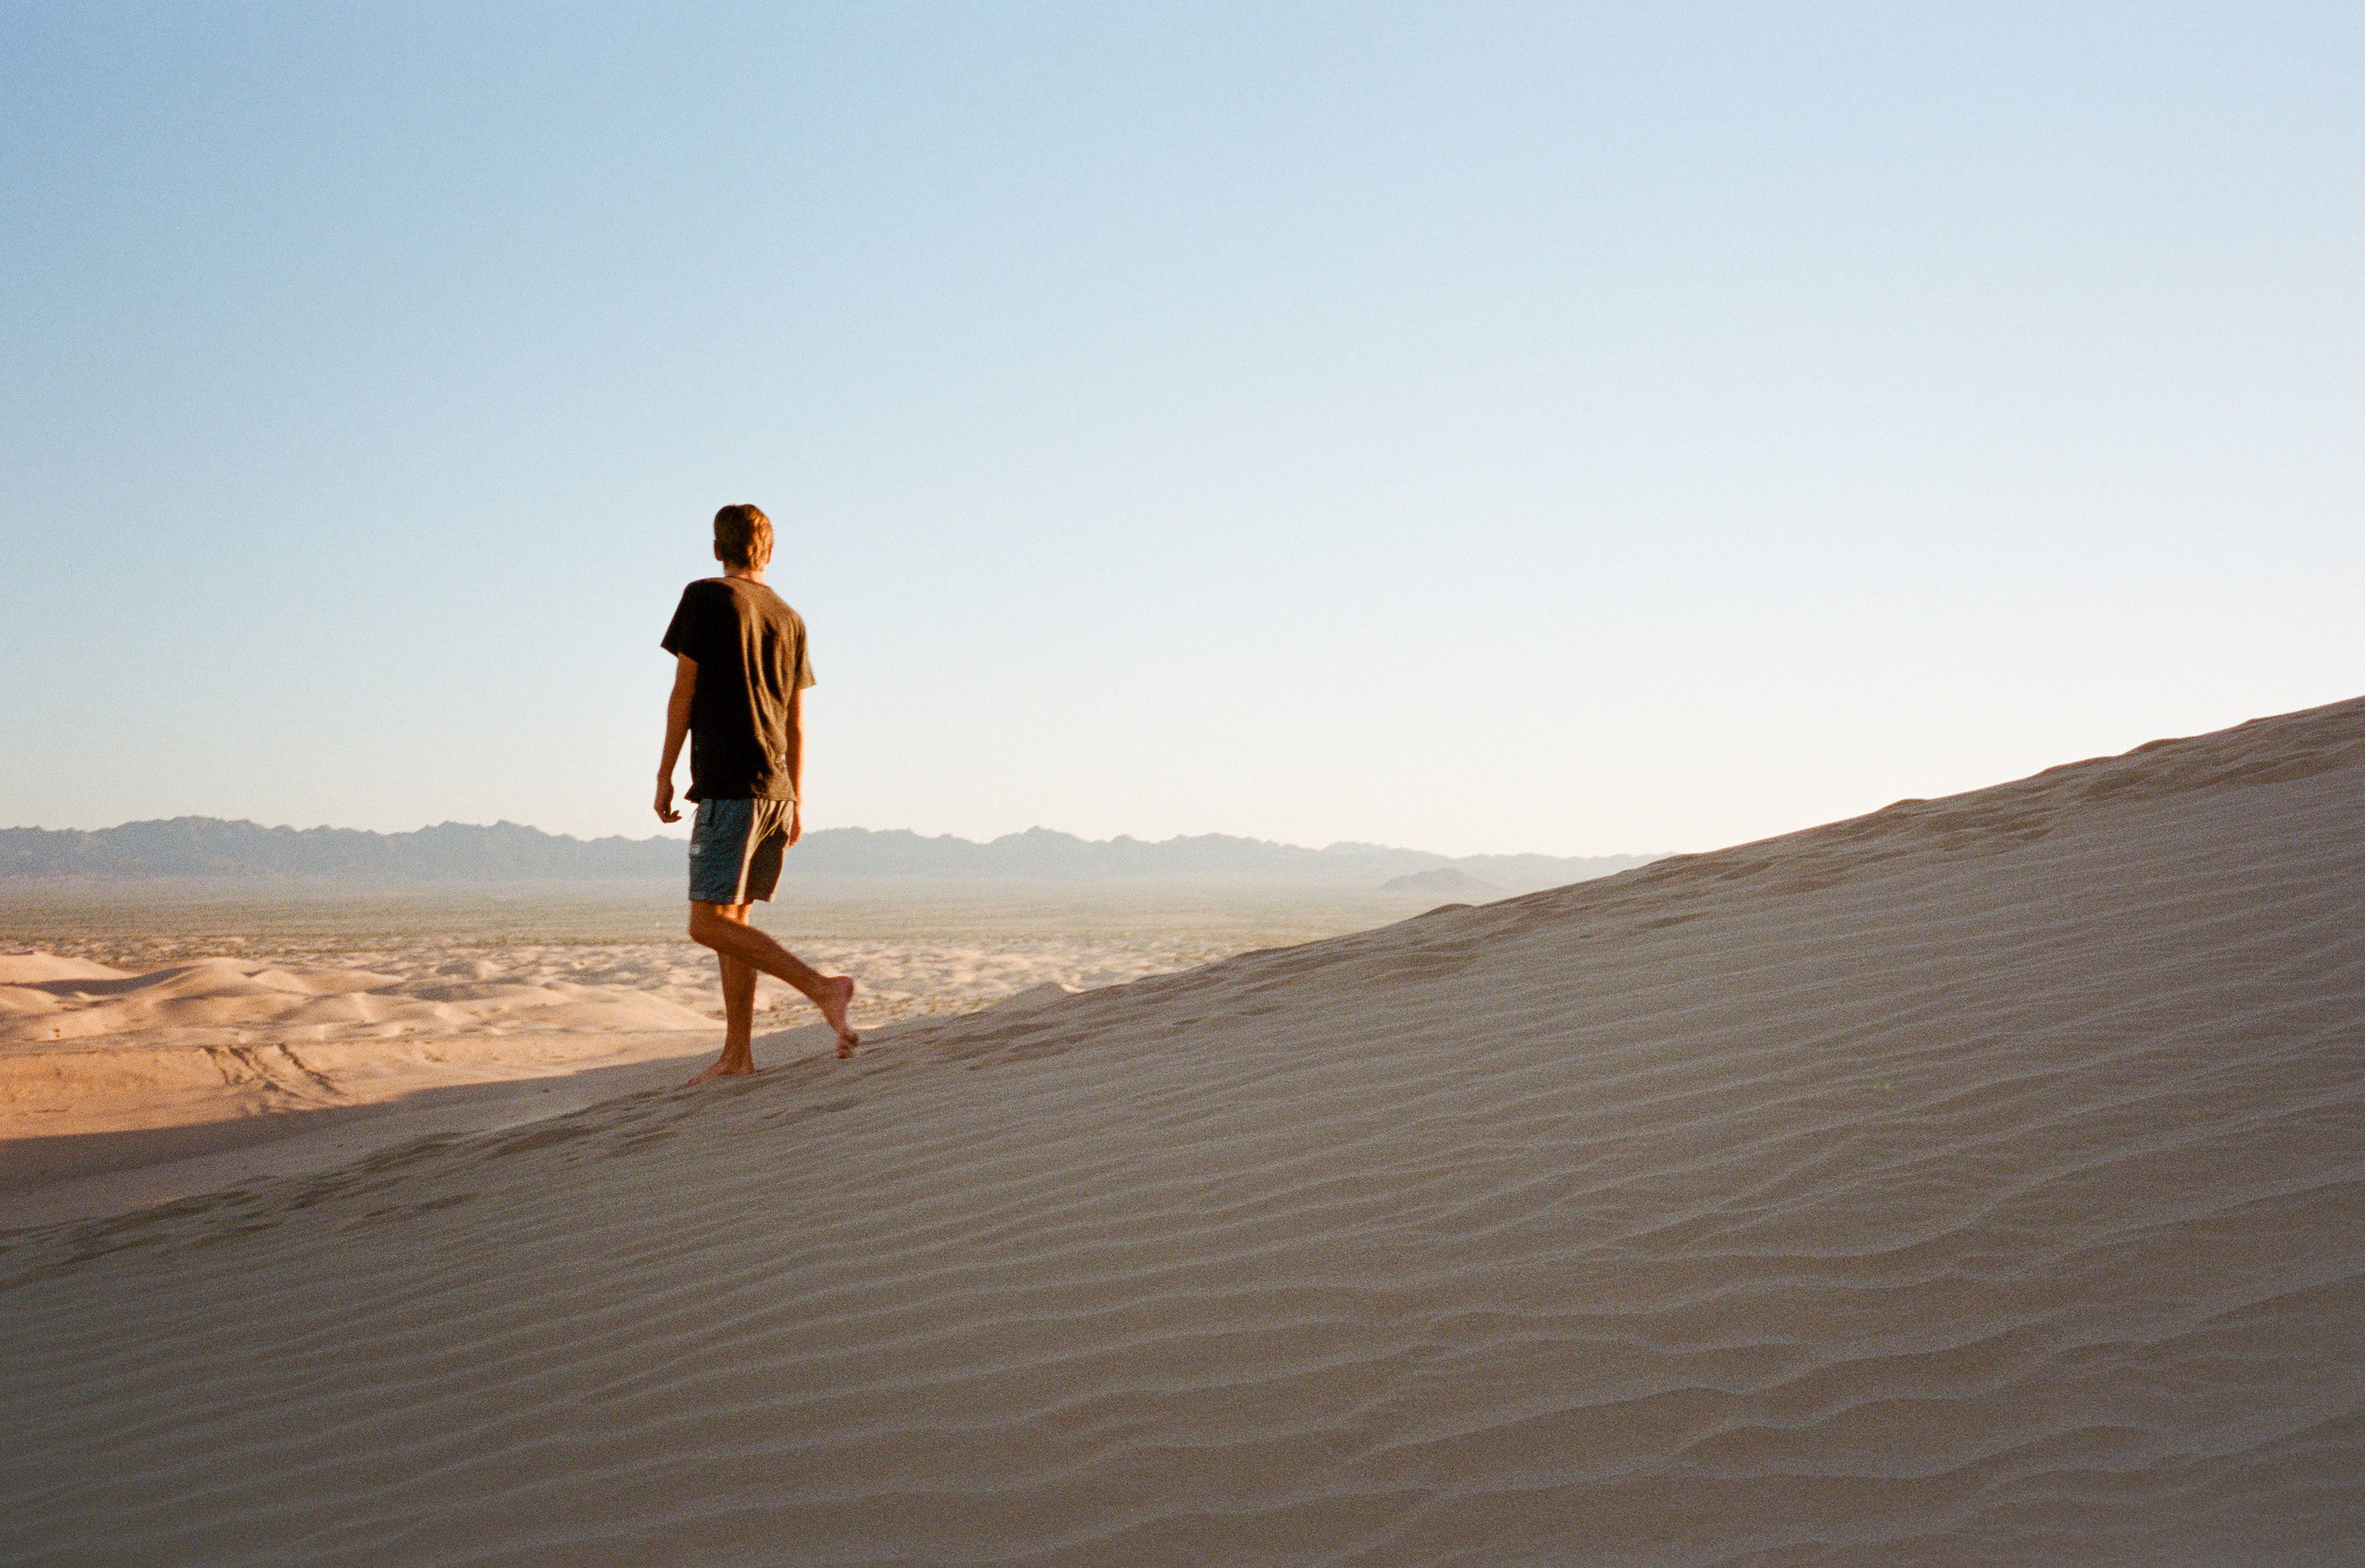 Sand Dunes_#9871-20.jpg